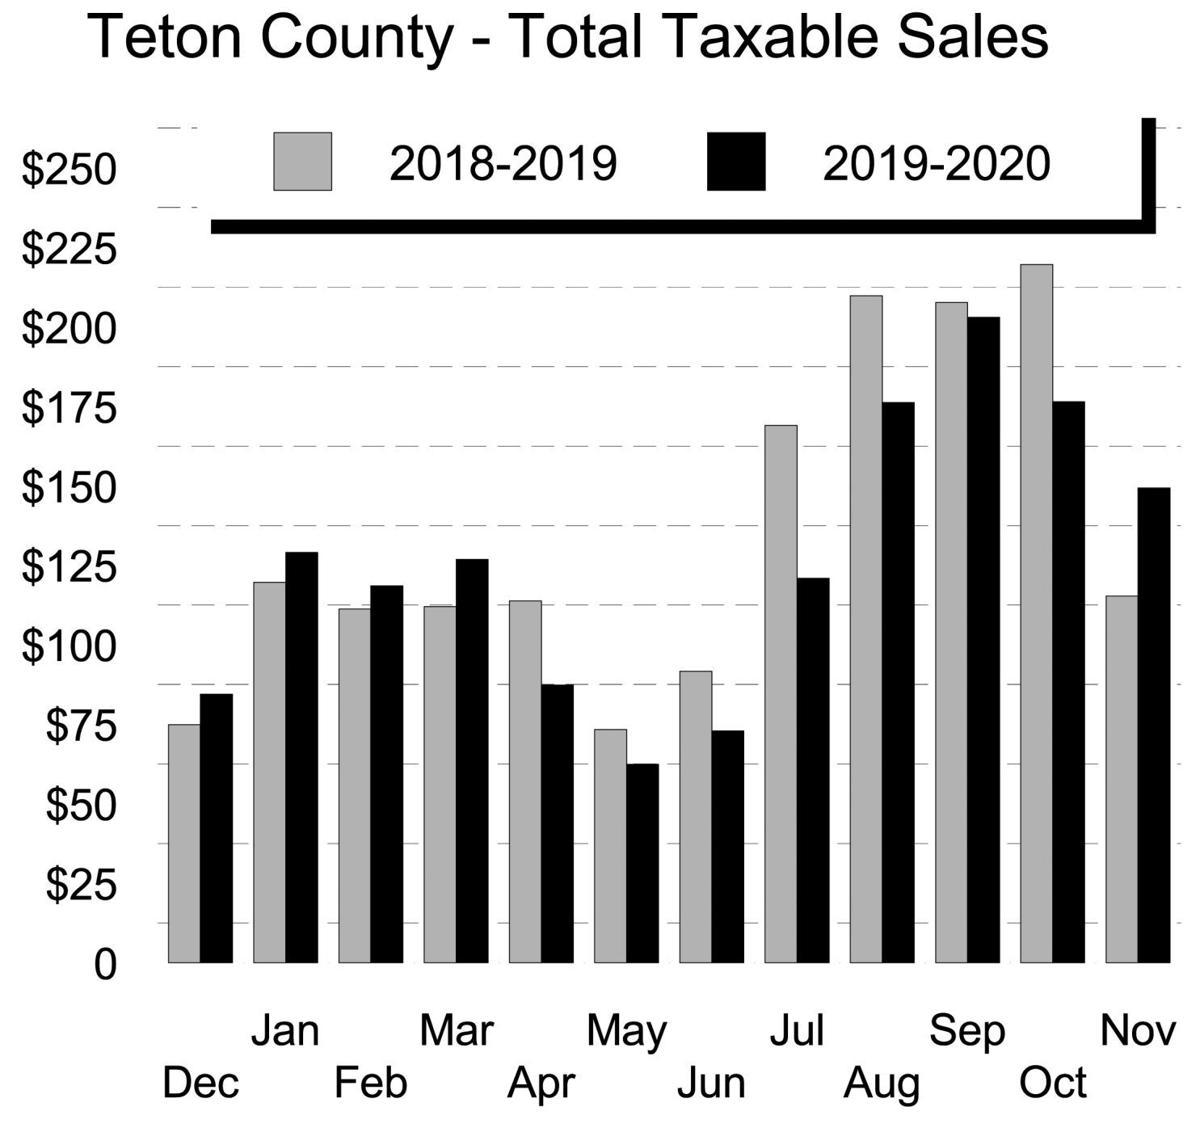 Teton County - Total Taxable Sales